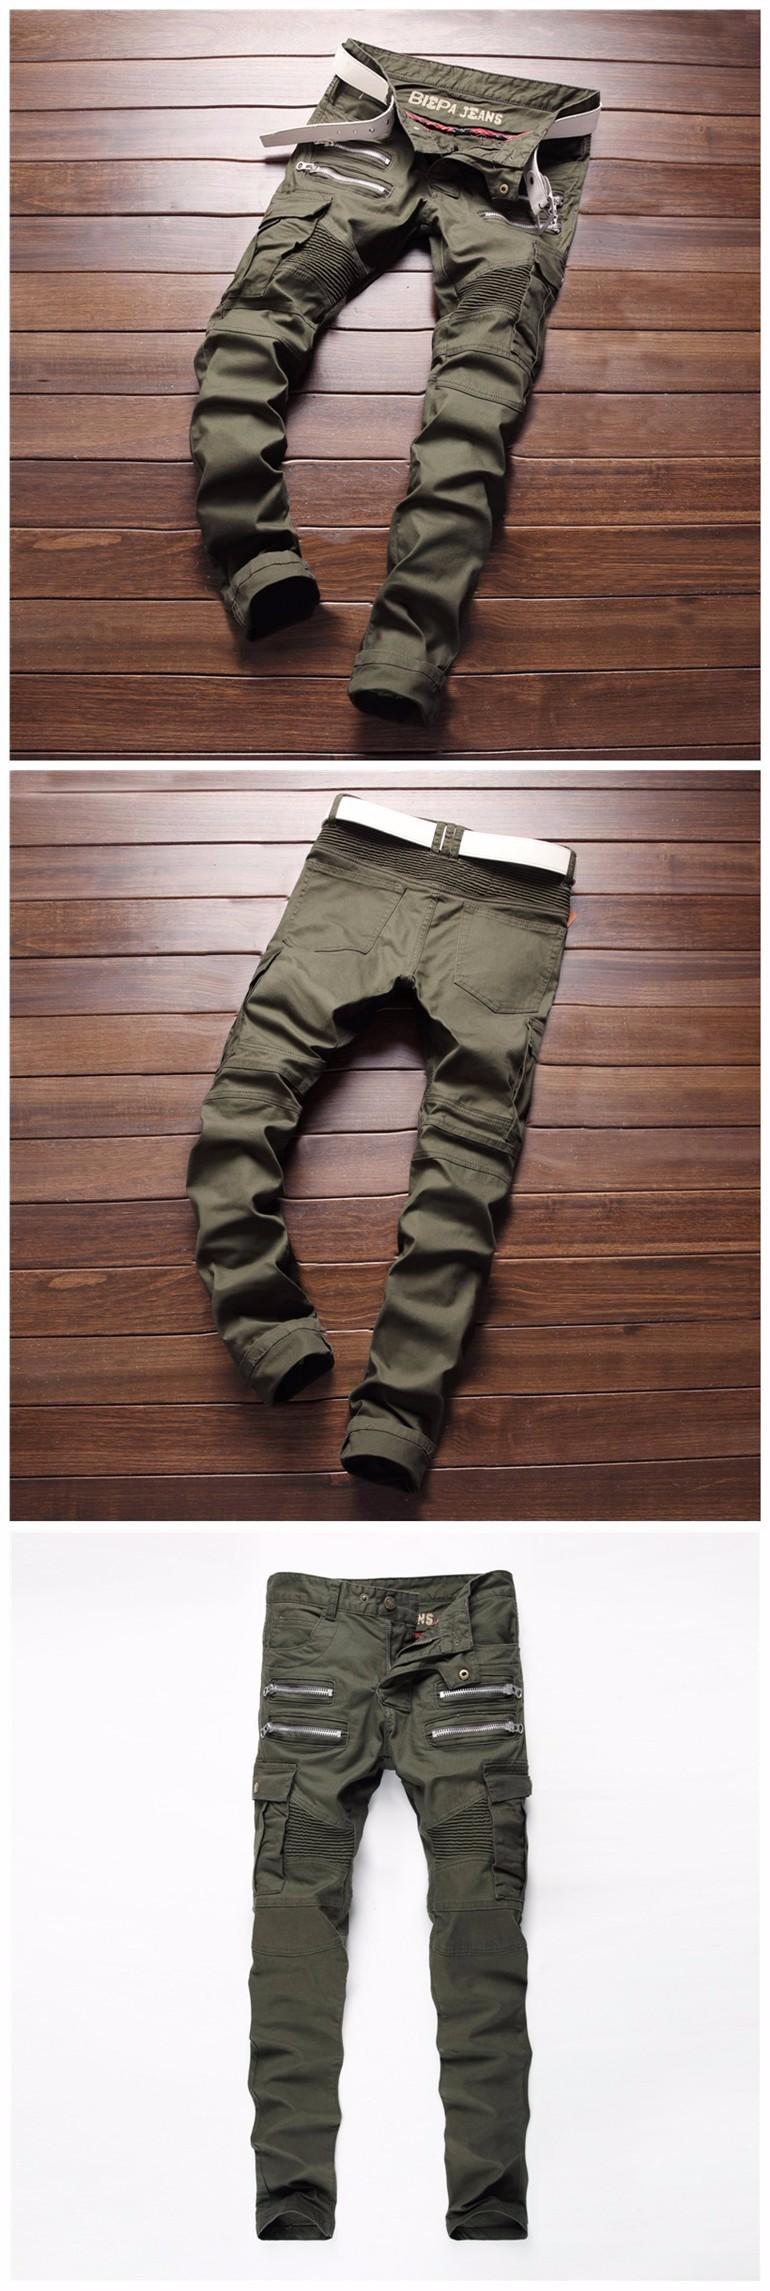 2017 Mens Skinny Biker Jeans Army Green Brand Fashion Denim Pants Pockets Cargo Pant Men Slim fit Jeans Cotton High quality (4)